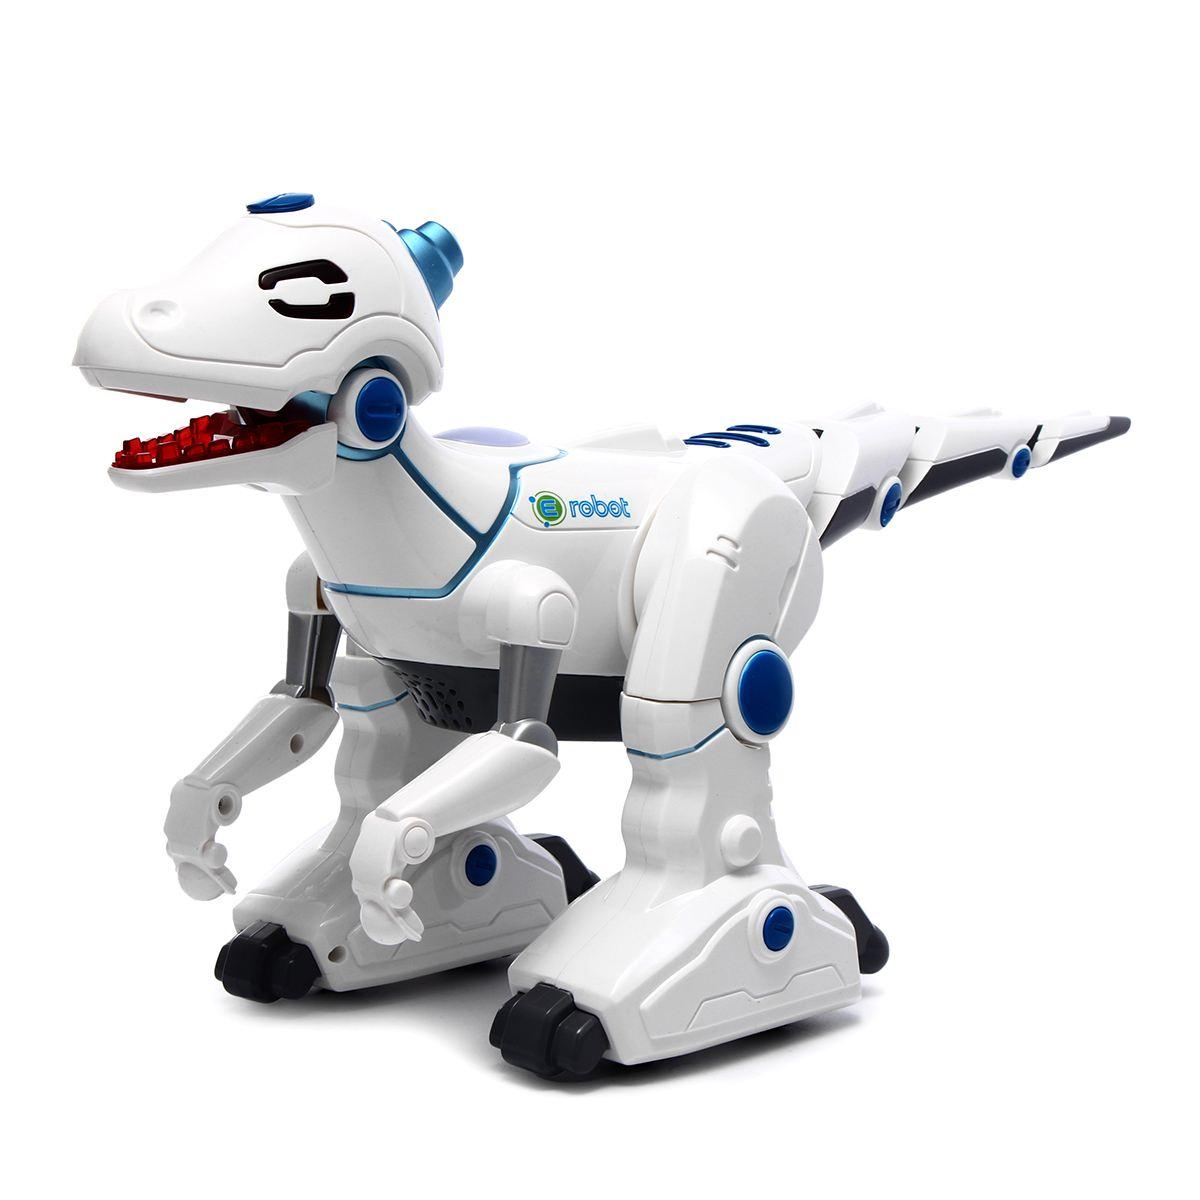 Smart Dinosaur Robot Electronic Remote Control Walking Singing Dancing Sound Light Toys Educational Toys Children Christmas Gift